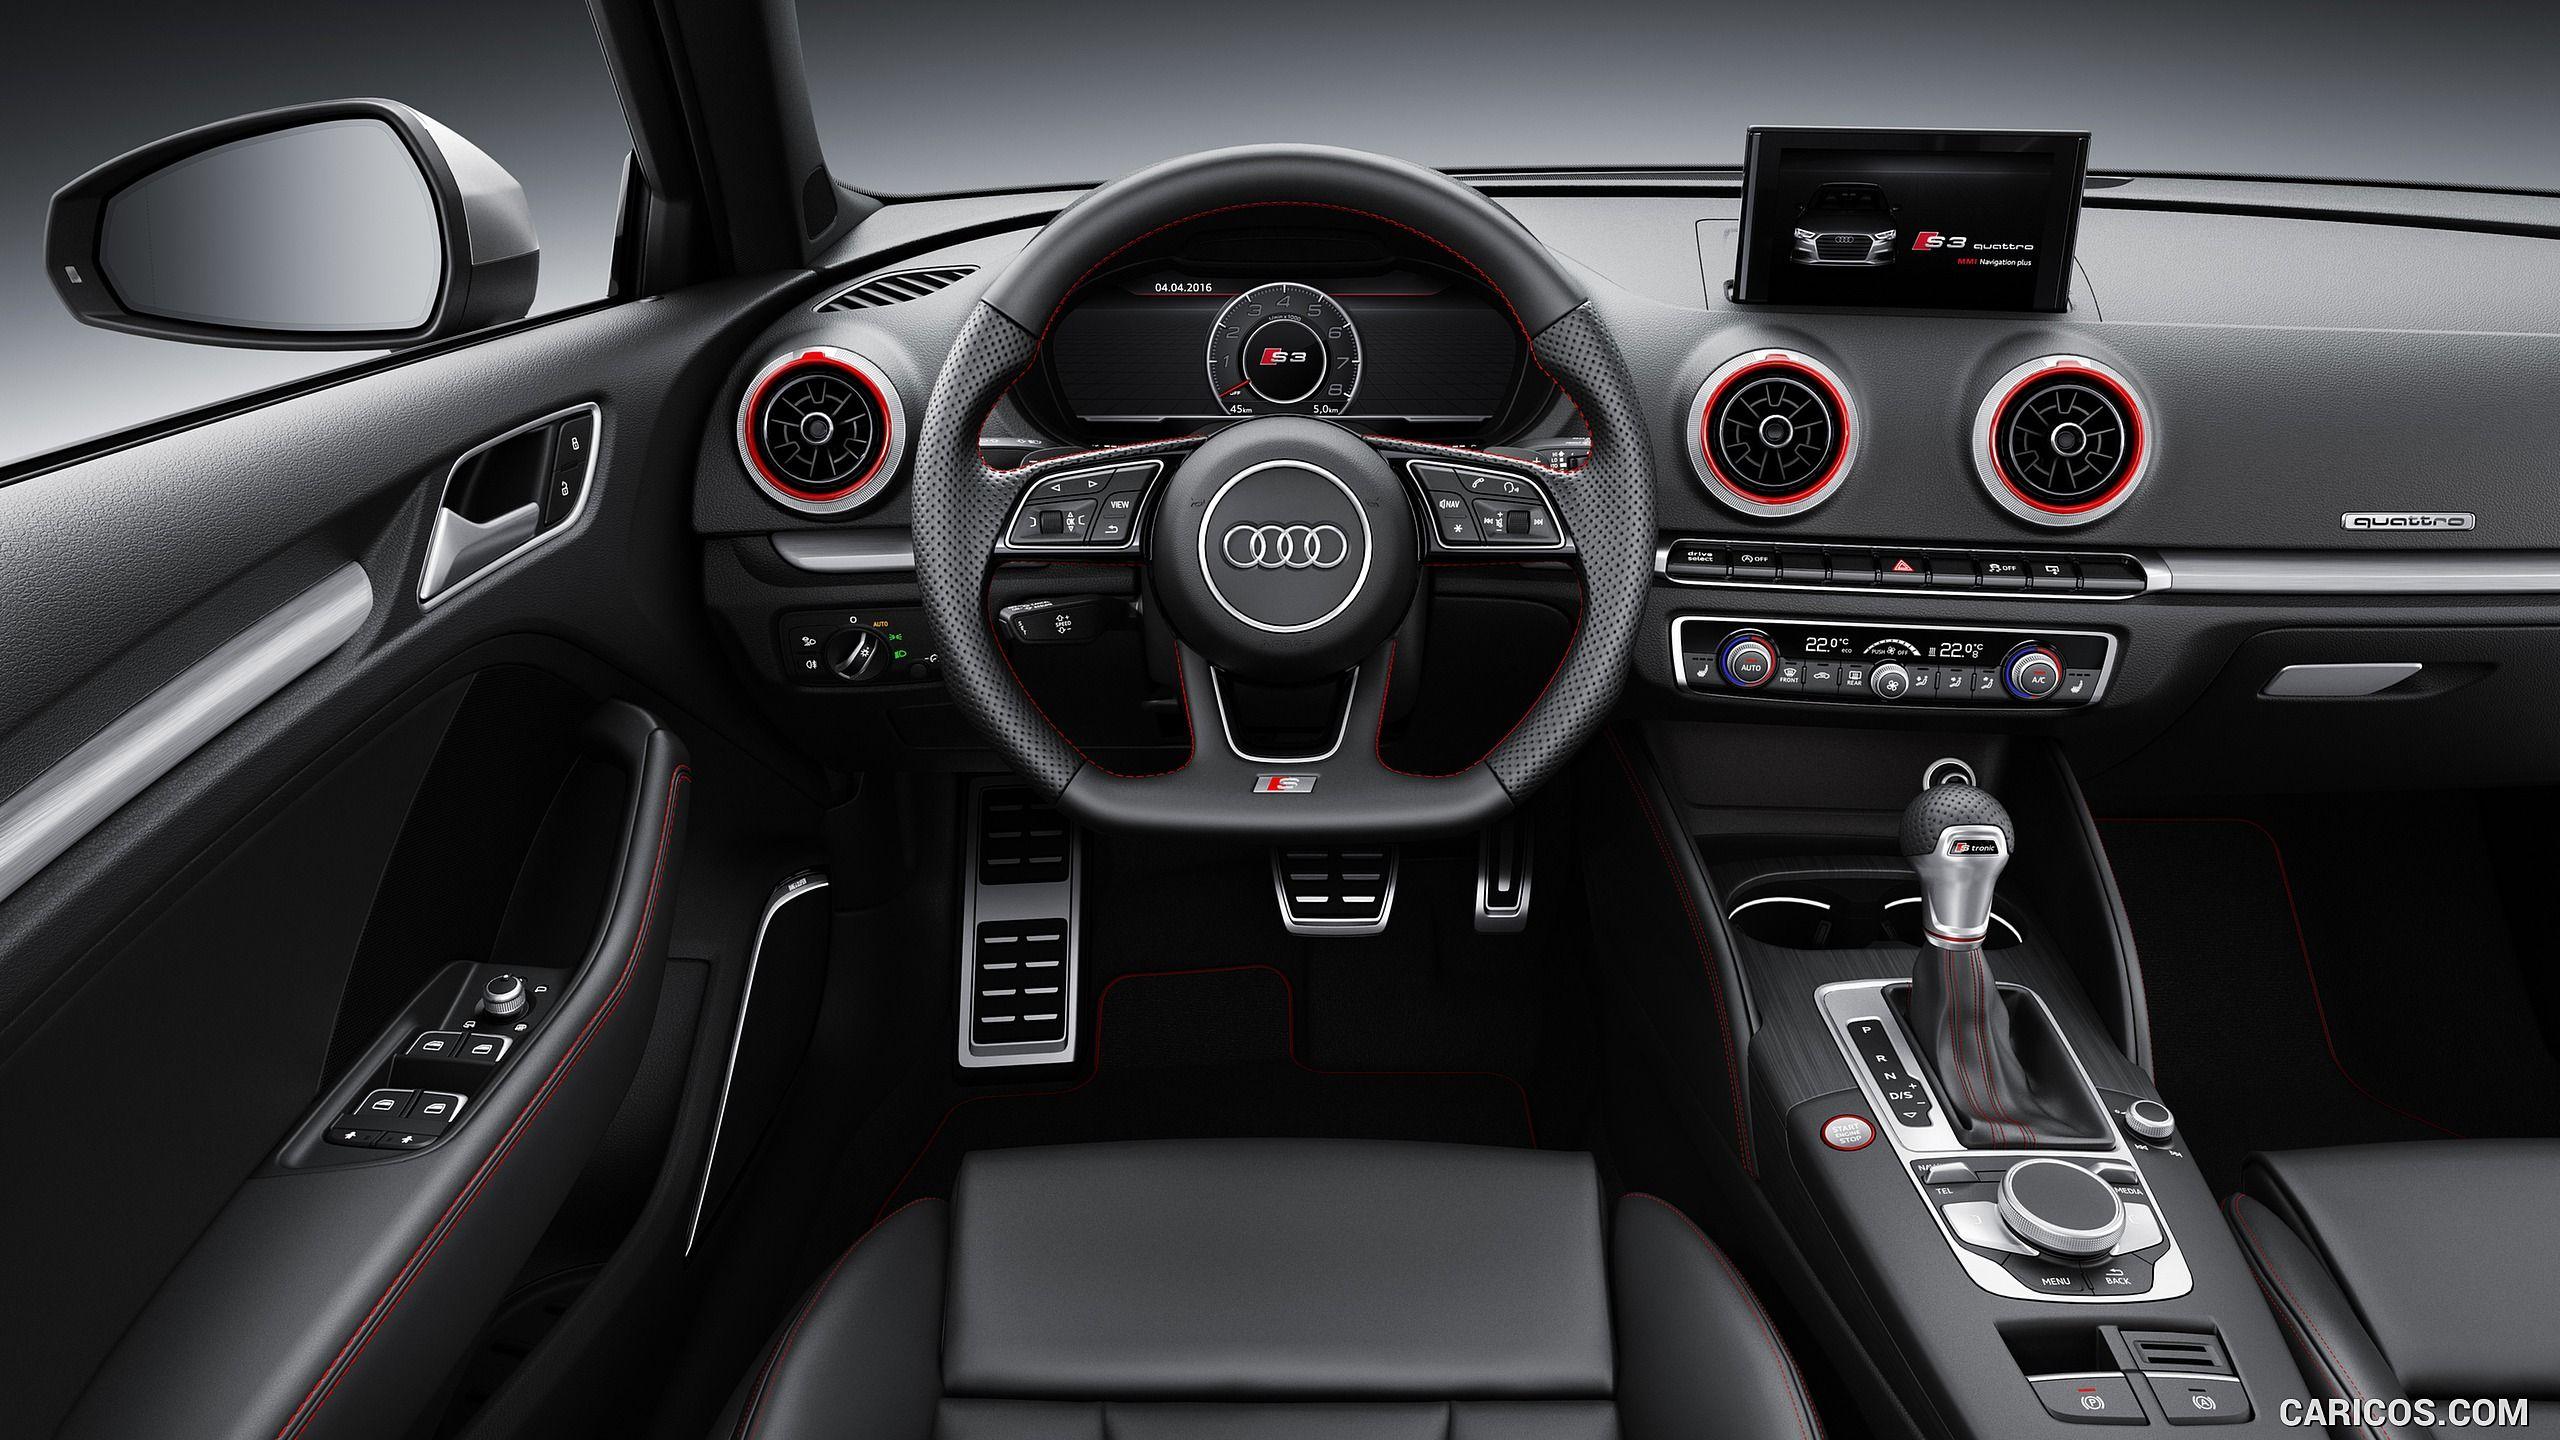 2017 Audi S3 Sportback Wallpaper auto Audi a3 sportback Audi 2560x1440